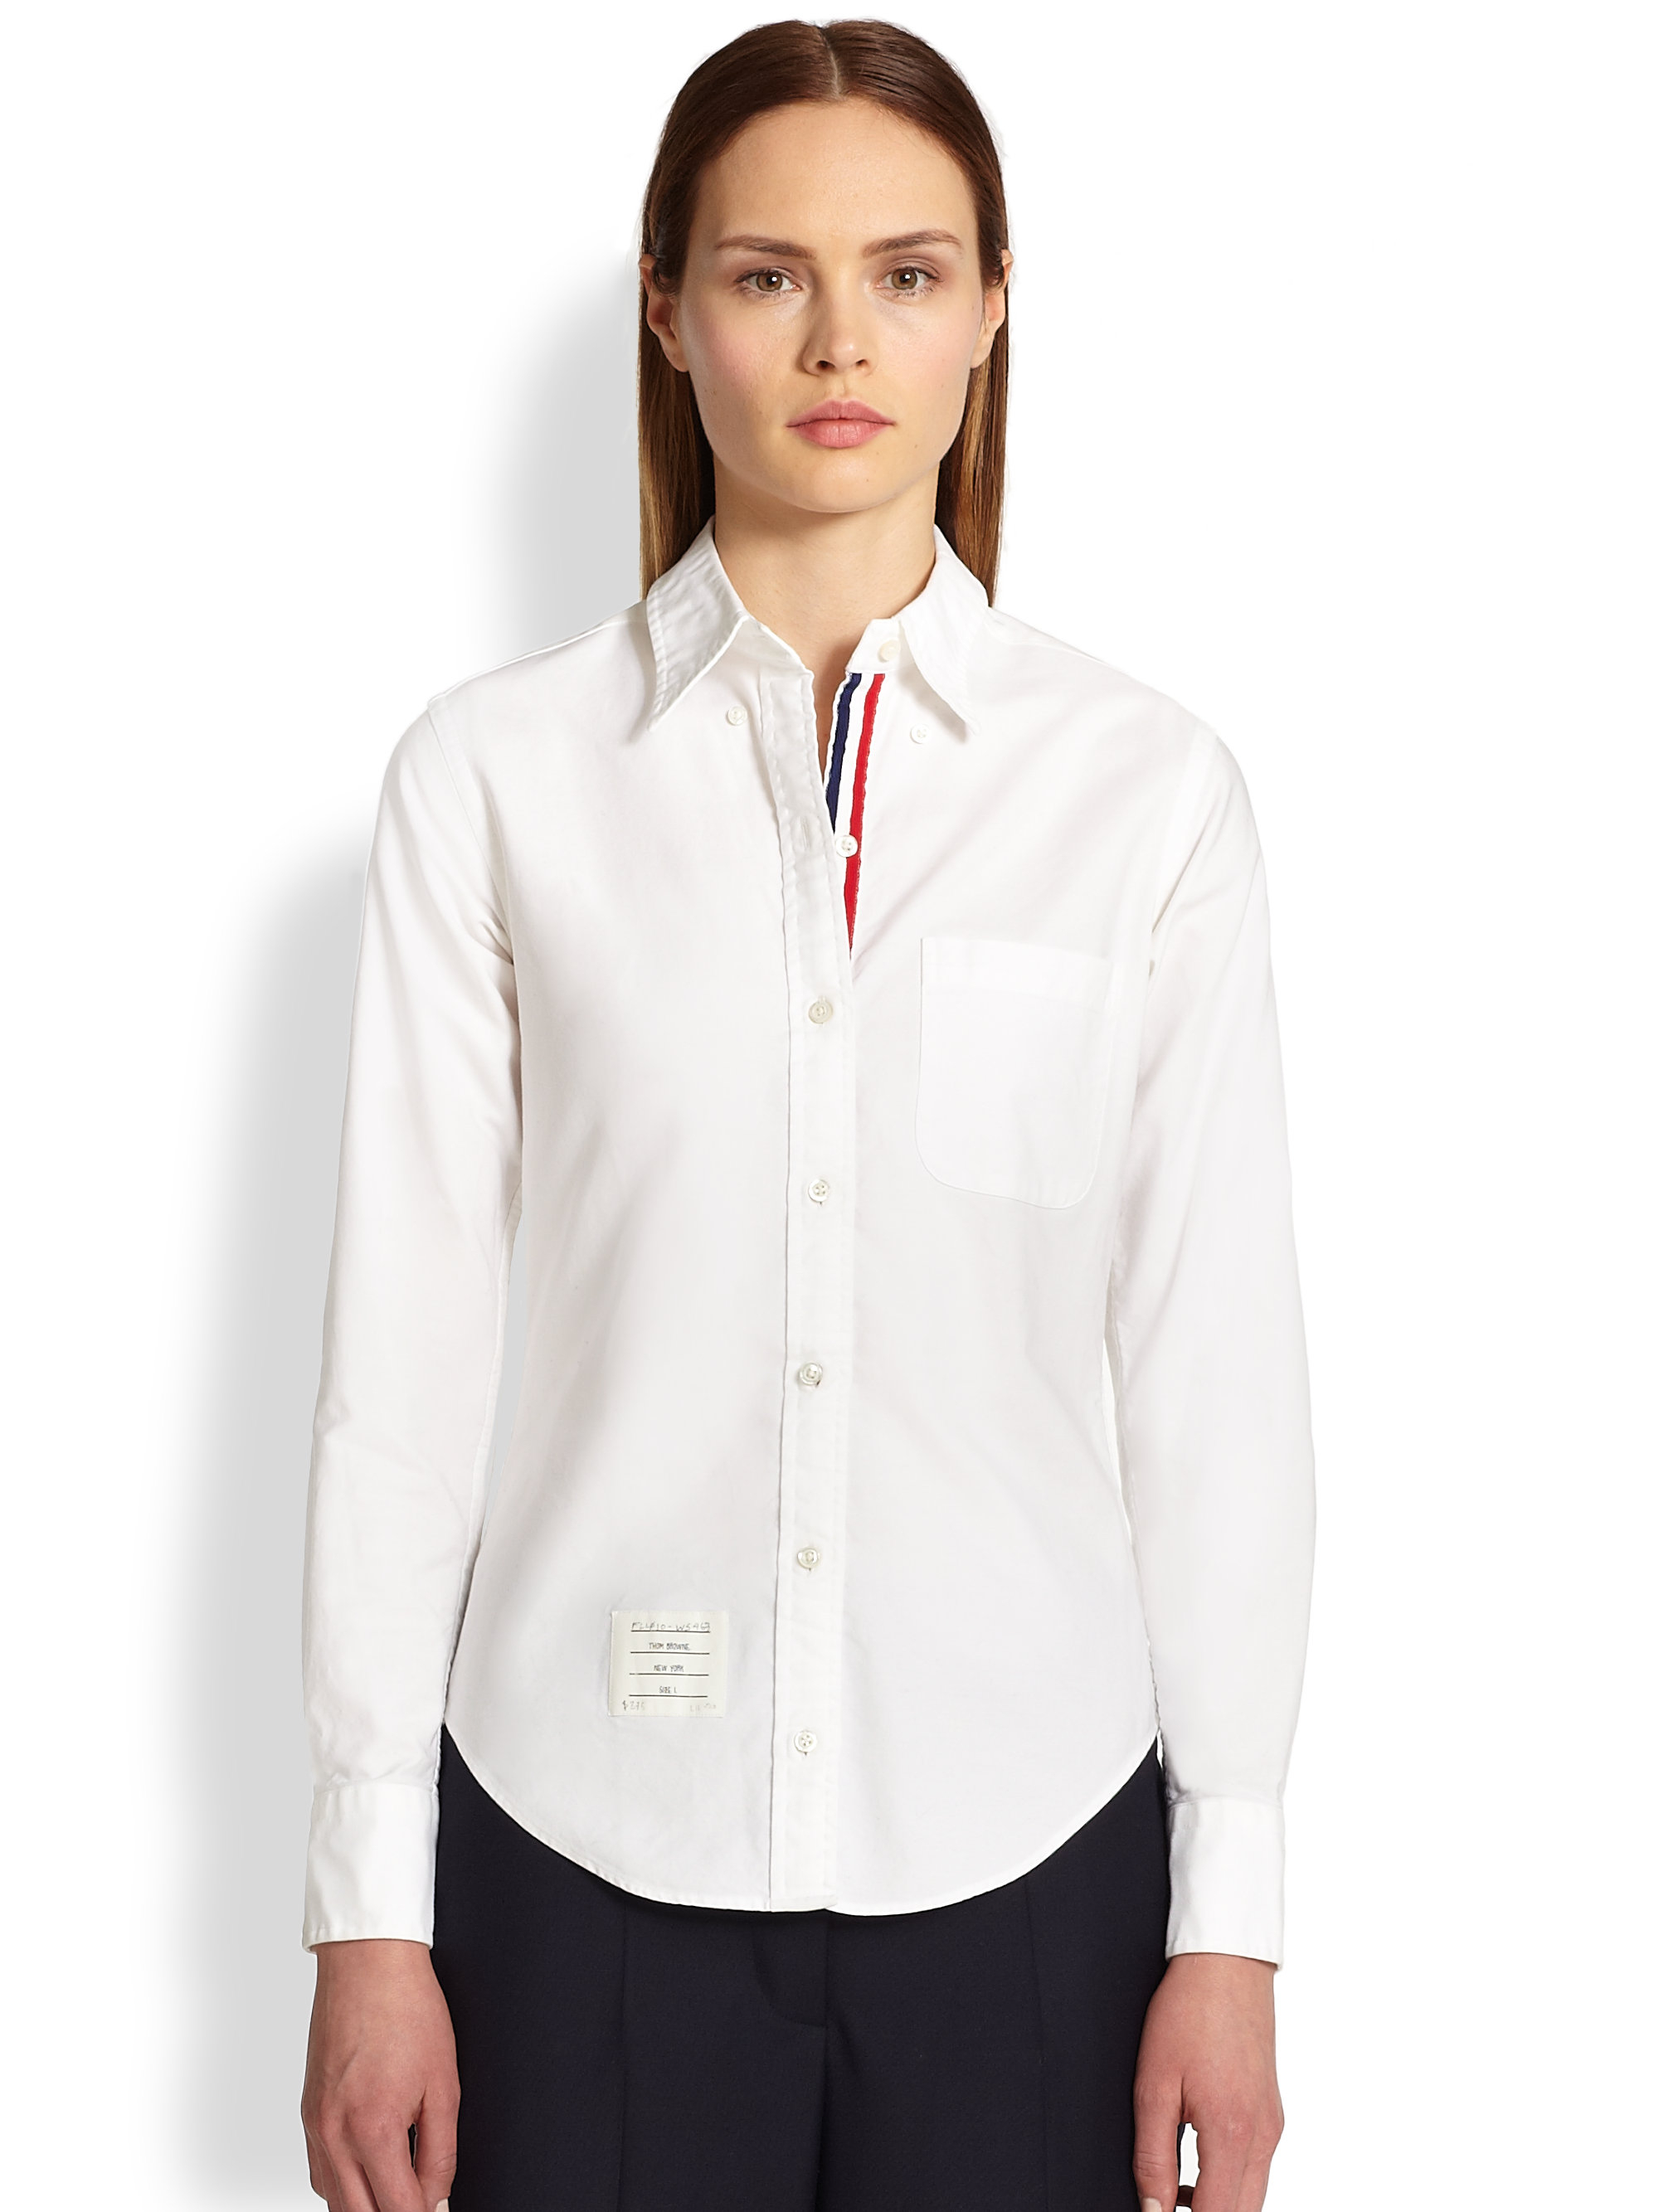 Lyst thom browne classic poplin shirt in white for Thom browne white shirt